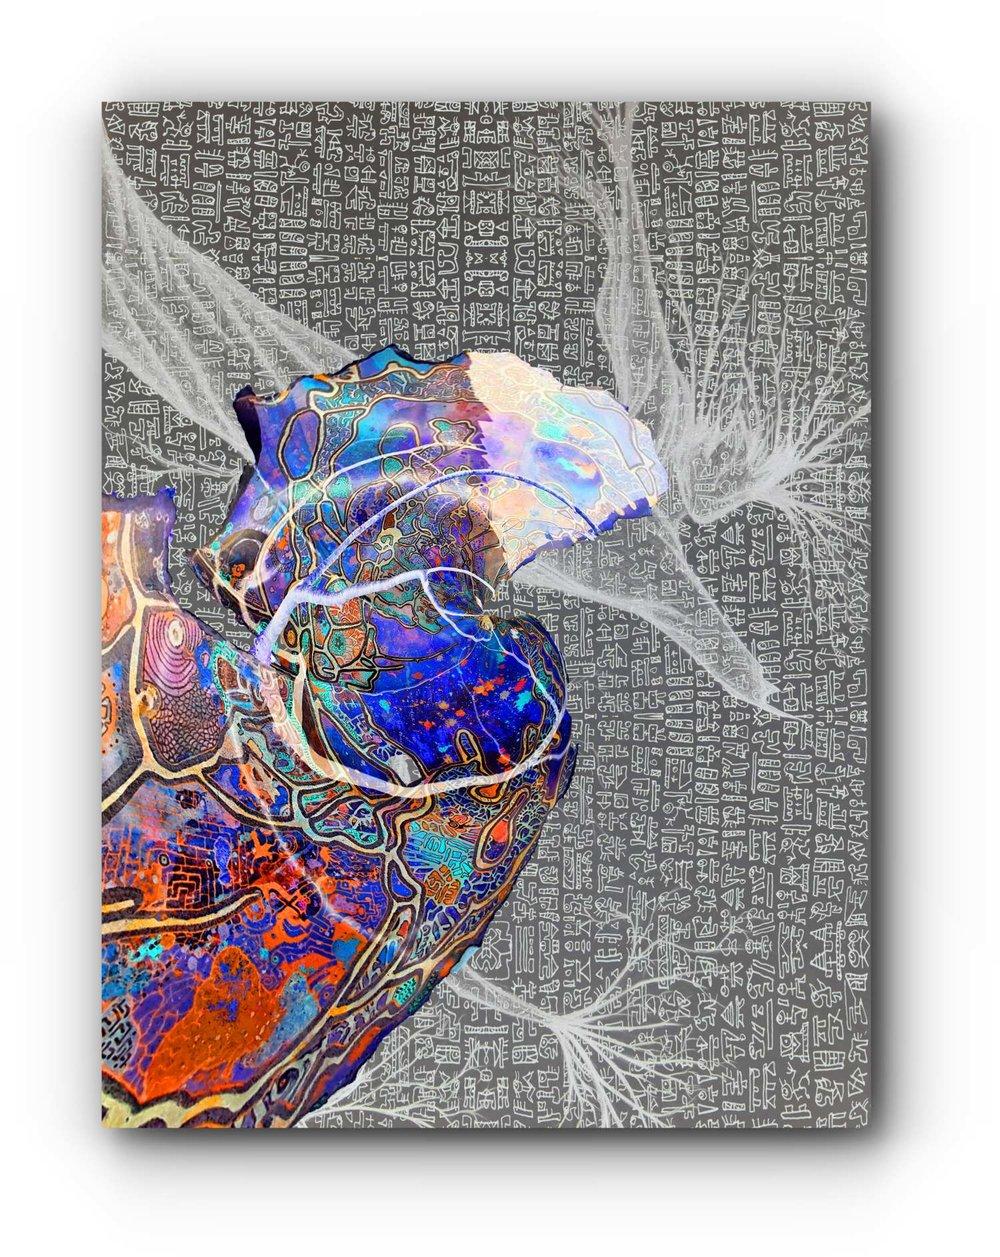 quantum-collage-phoenix-whisper-artist-duo-ingress-vortices.jpg